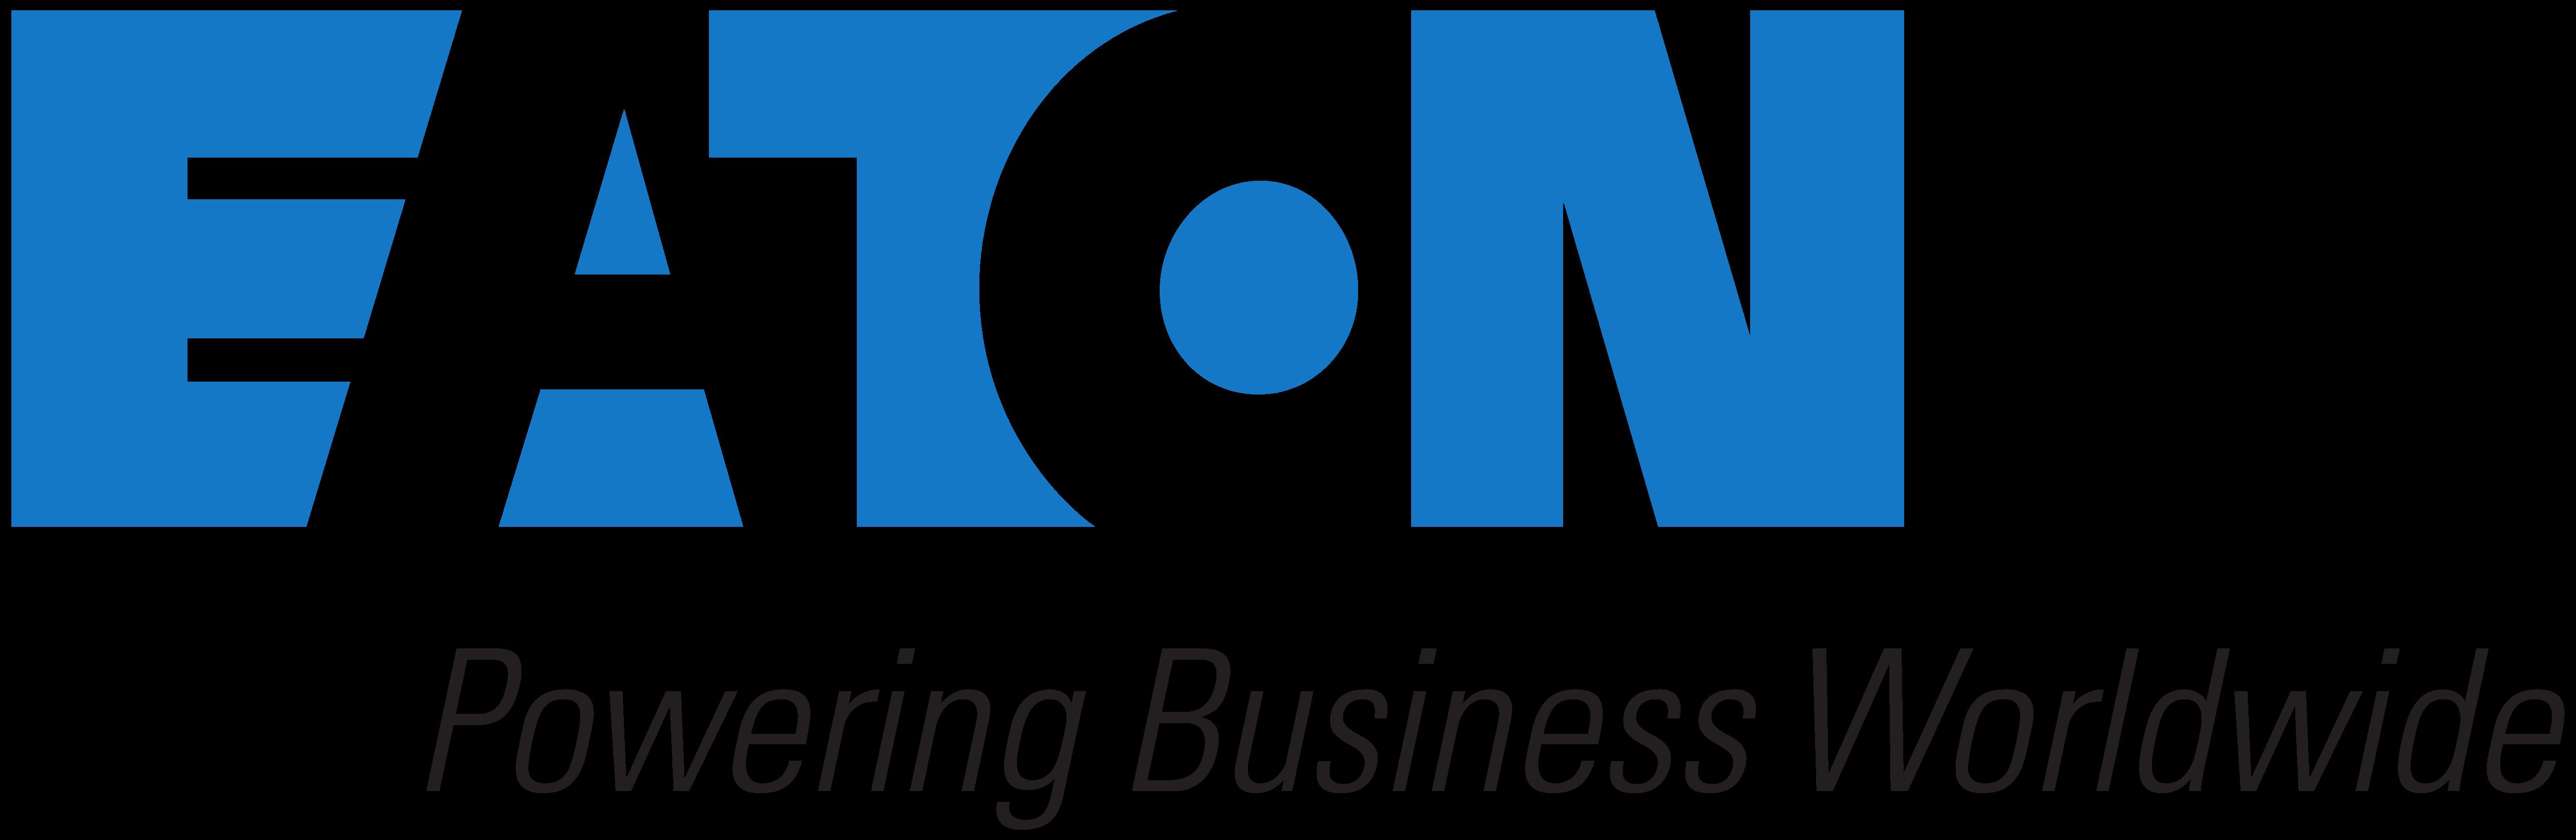 Eaton Logo Wallpaper